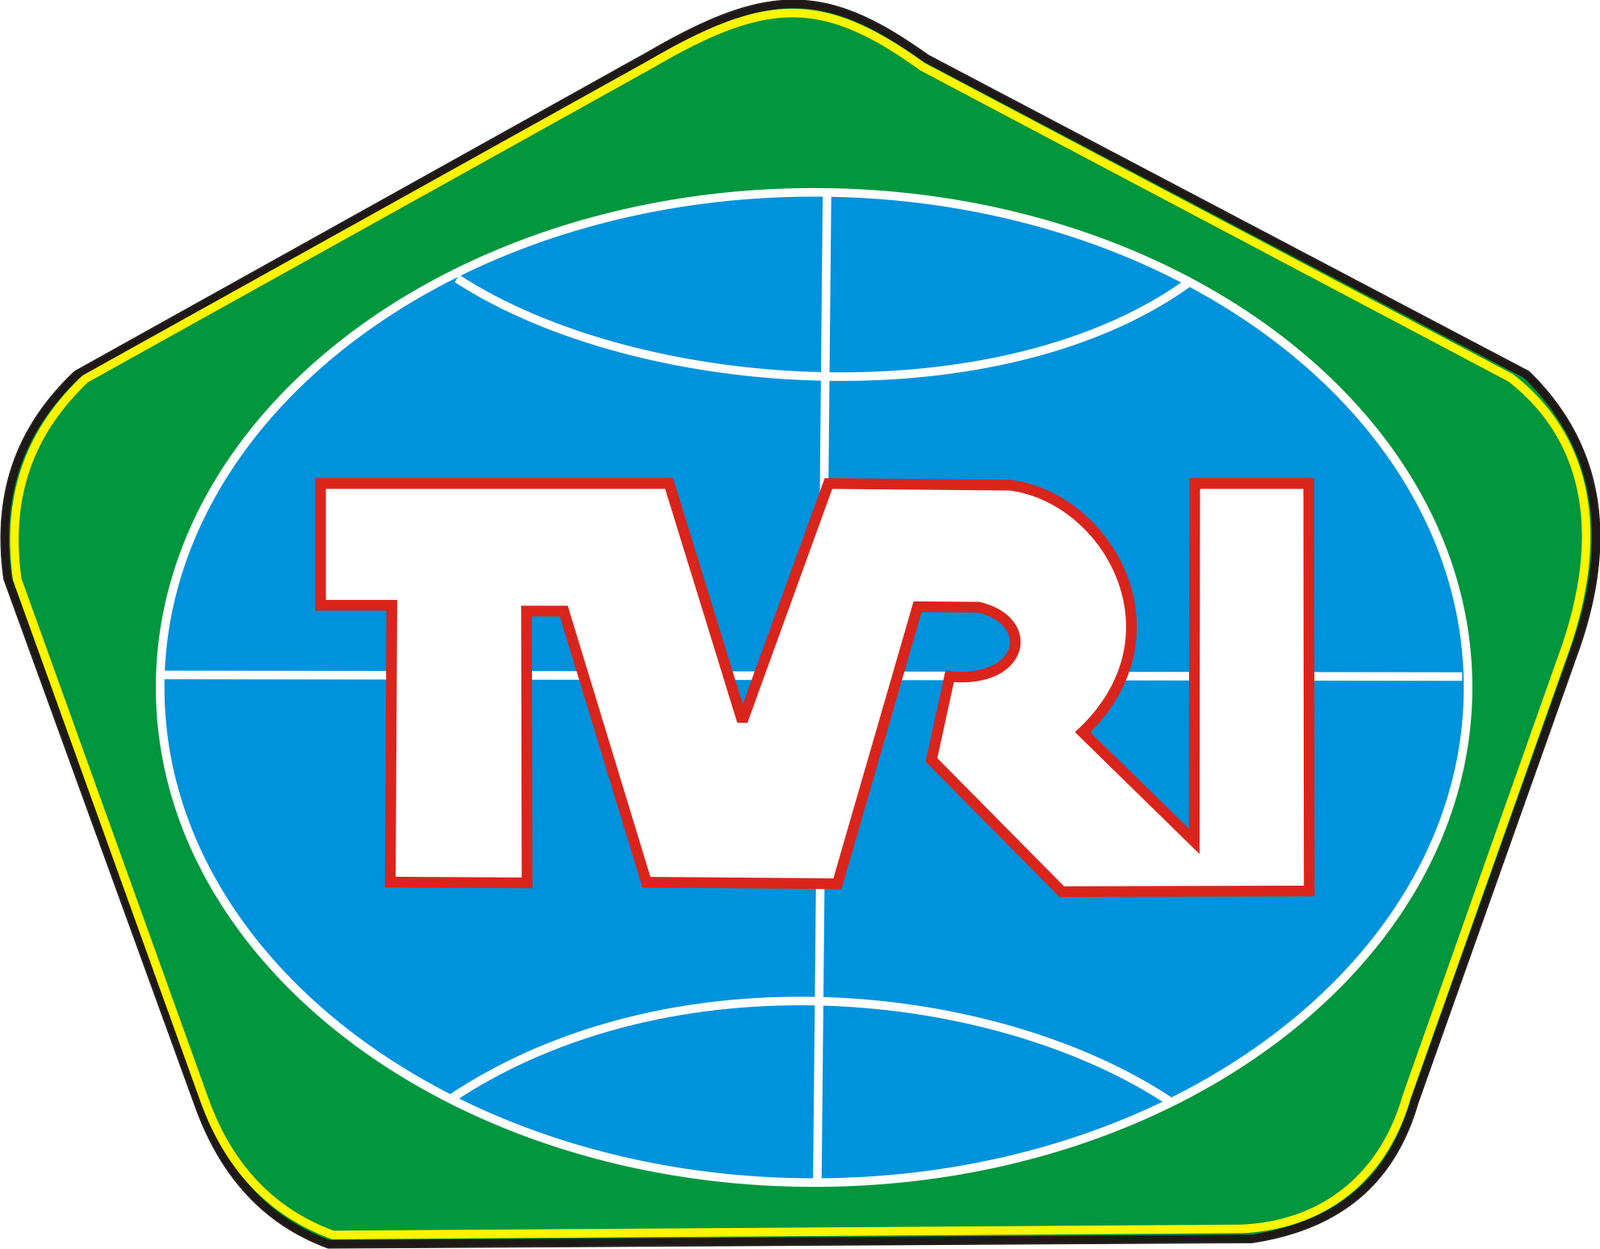 Logo Tvri Gambar Logo